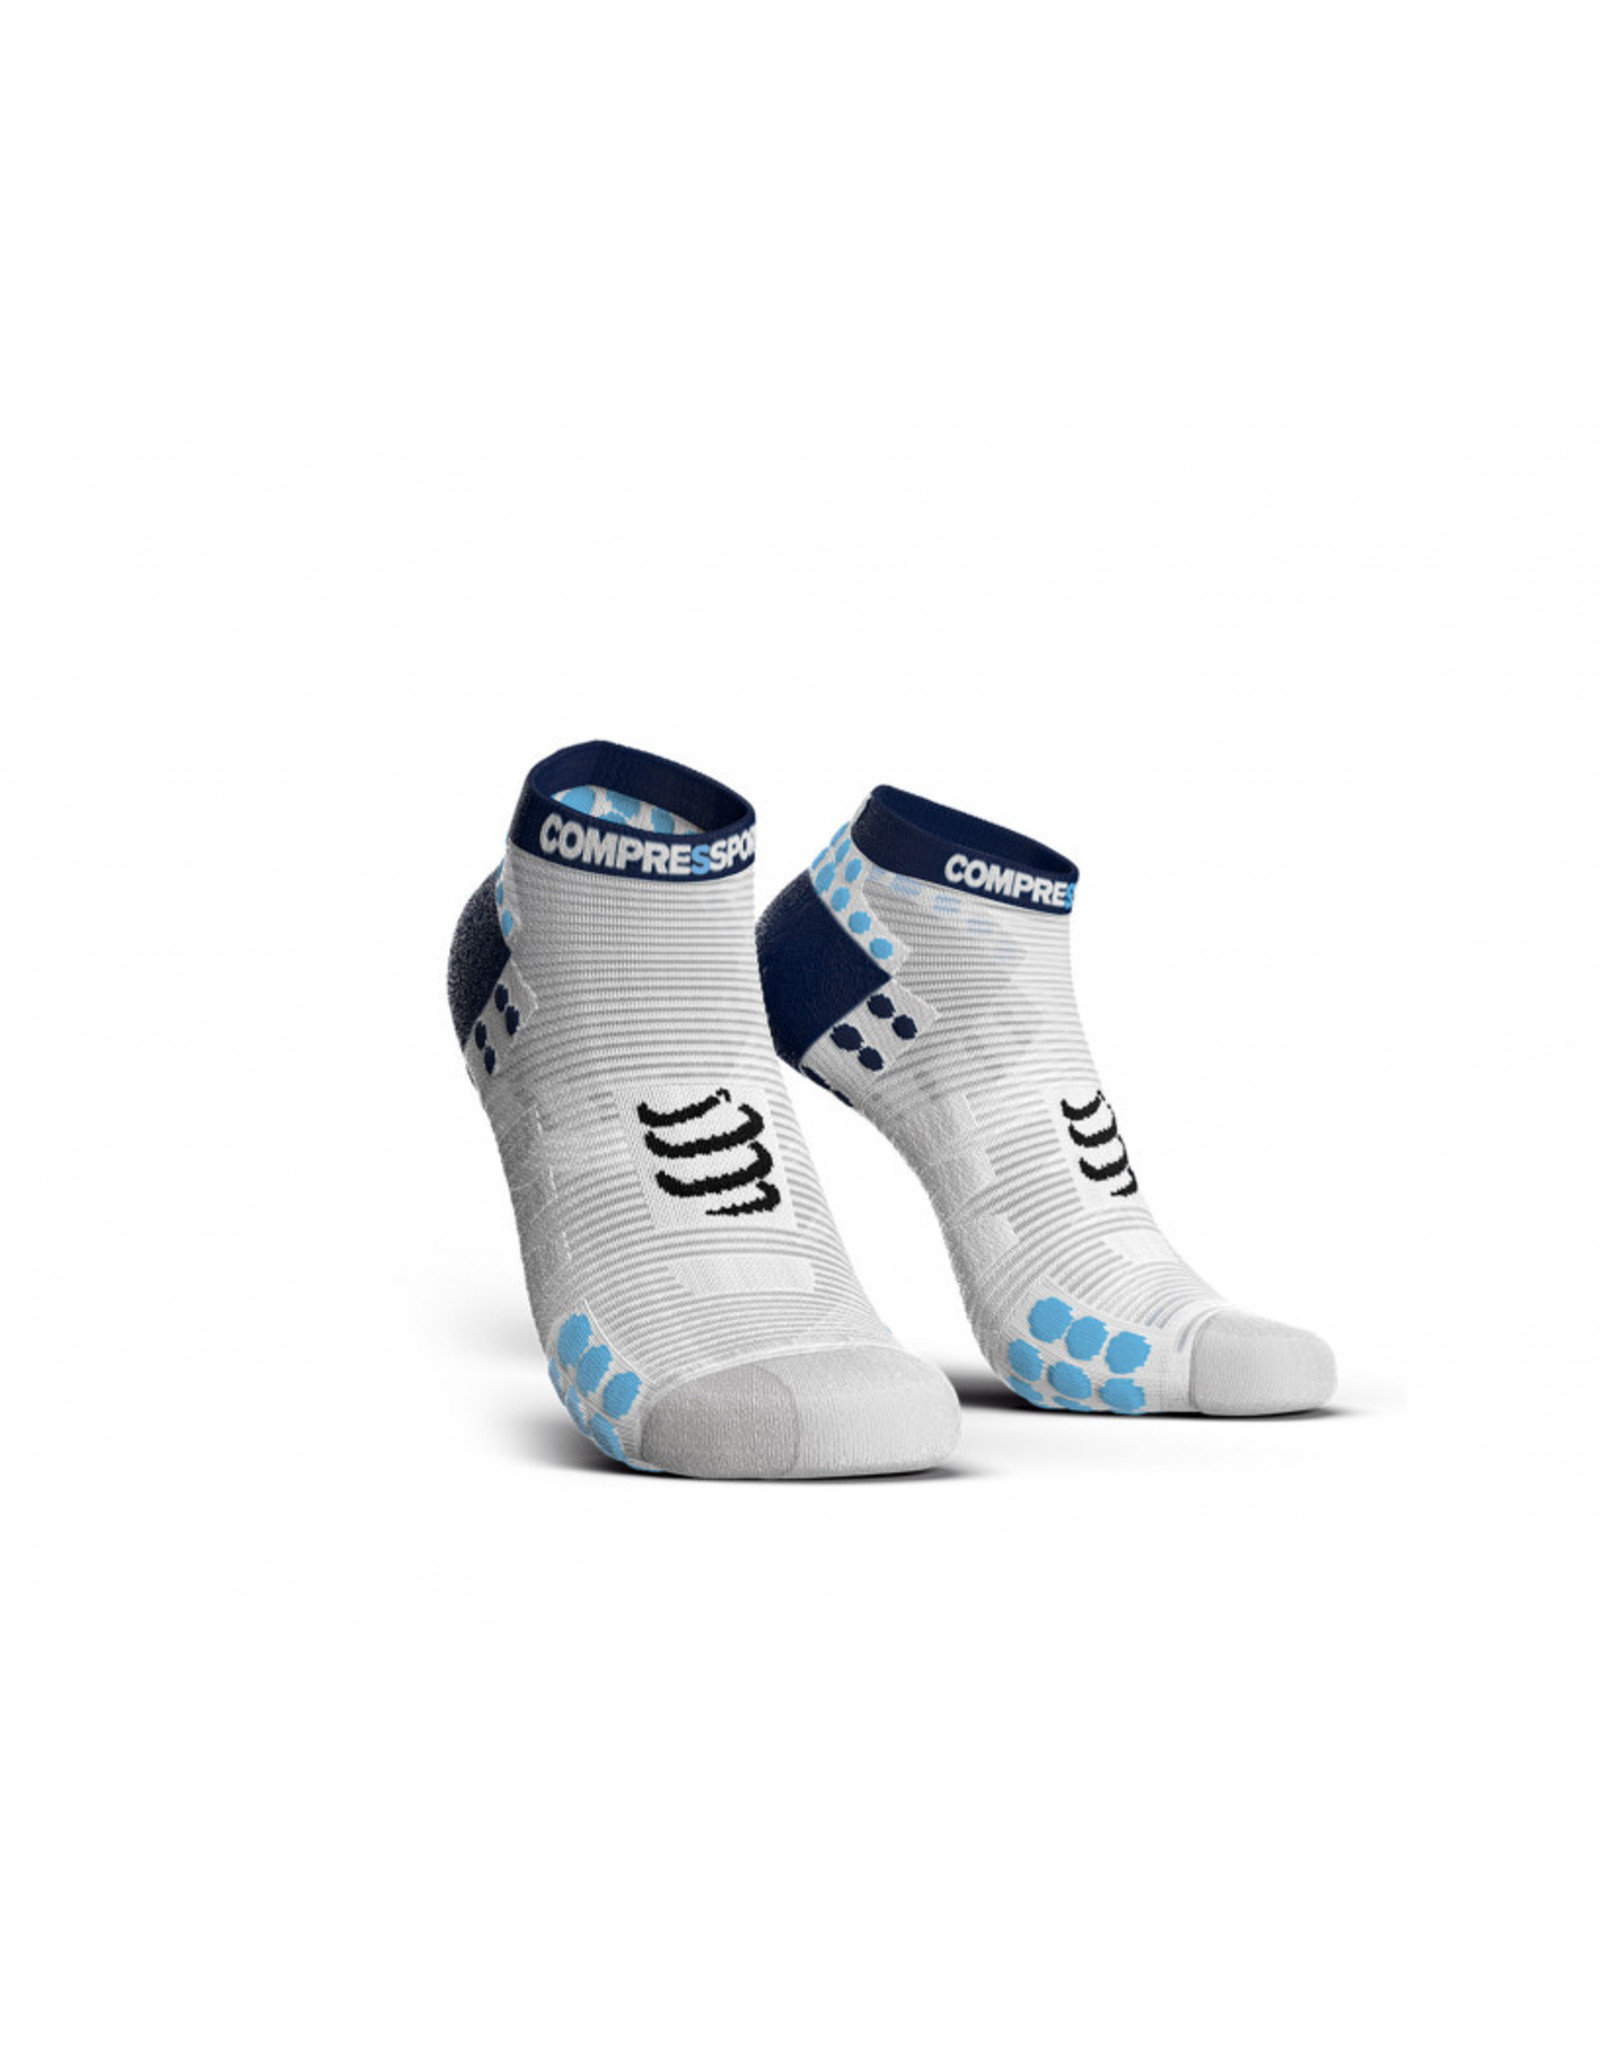 Compressport Pro Racing Socks V3.0 Run Low Hardloopsokken Laag - Wit/Blauw